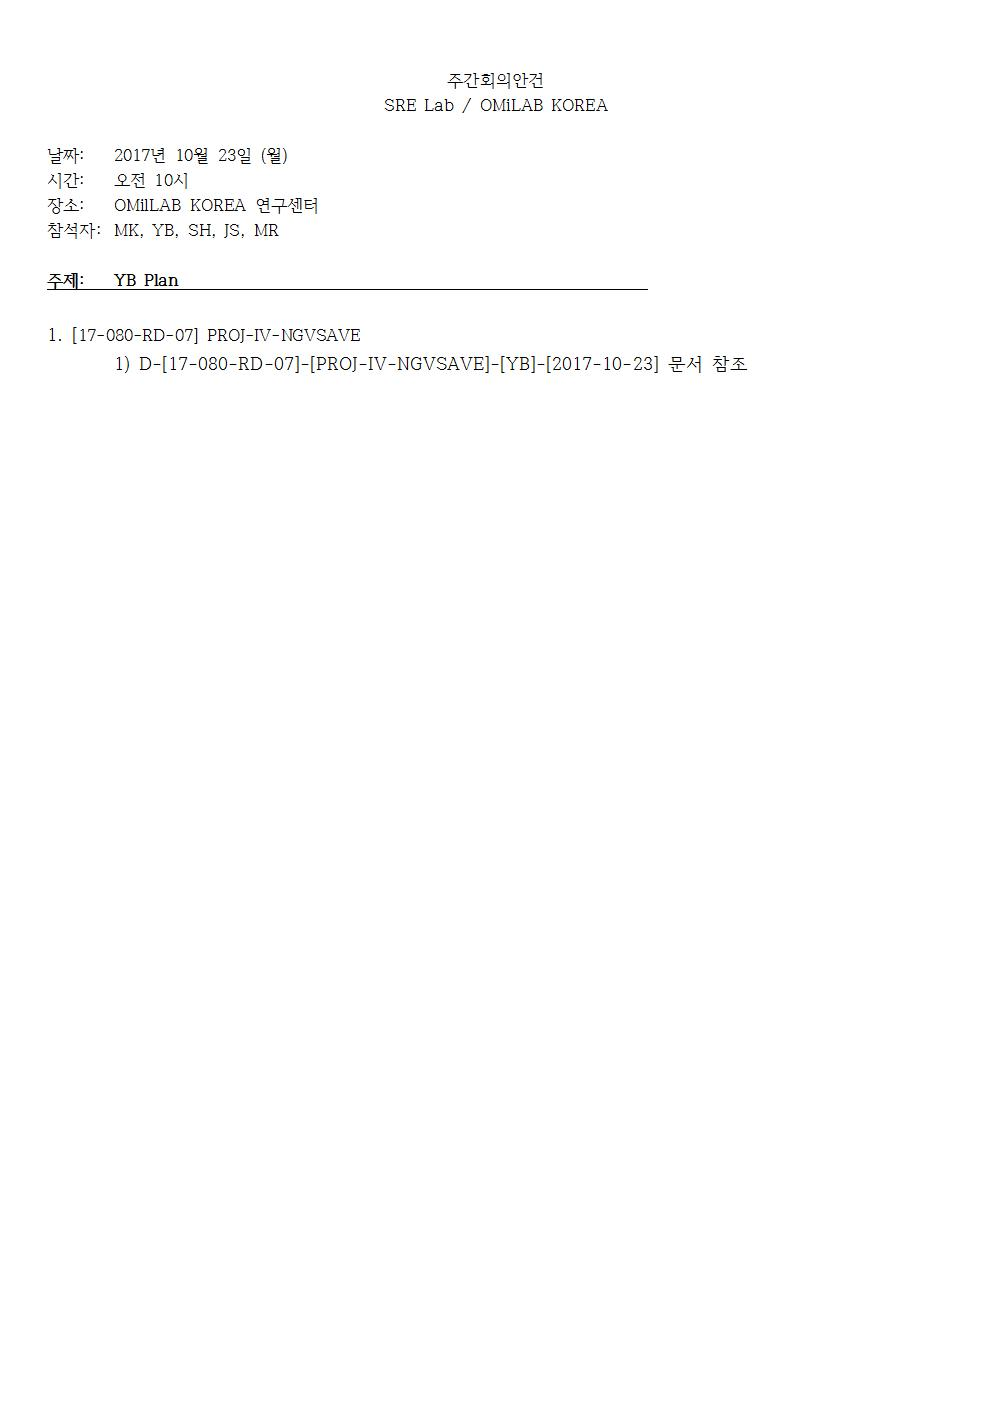 1-Mon-2017-10-23-PLAN(YB)001.jpg